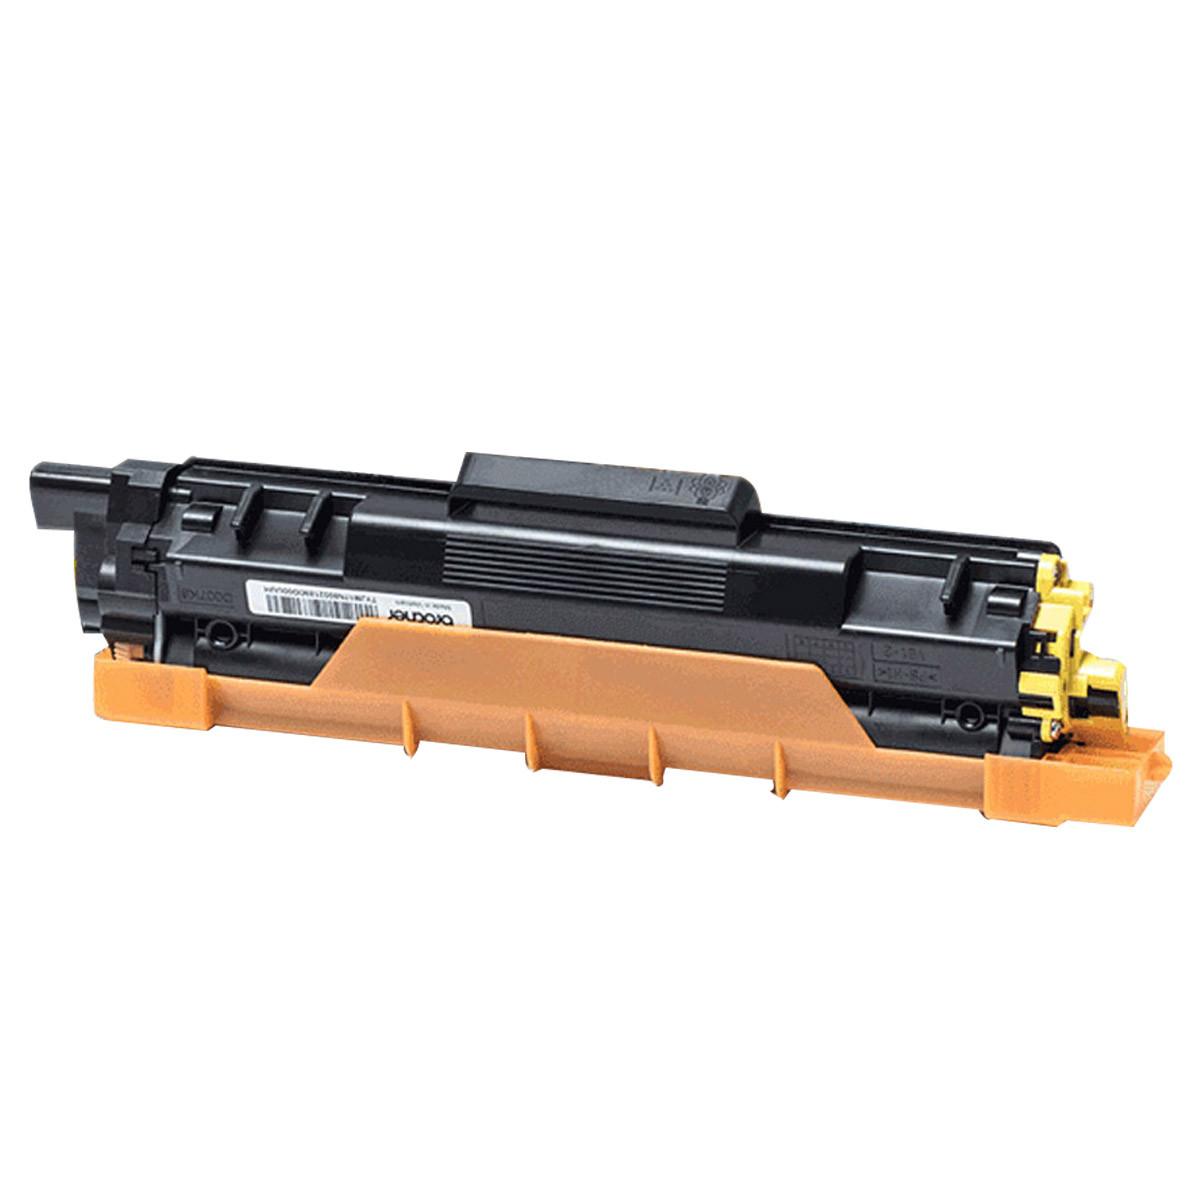 Toner Compatível com Brother TN-217Y TN-217 Amarelo   HLL3210CW DCPL3551CDW   Importado 2.3k